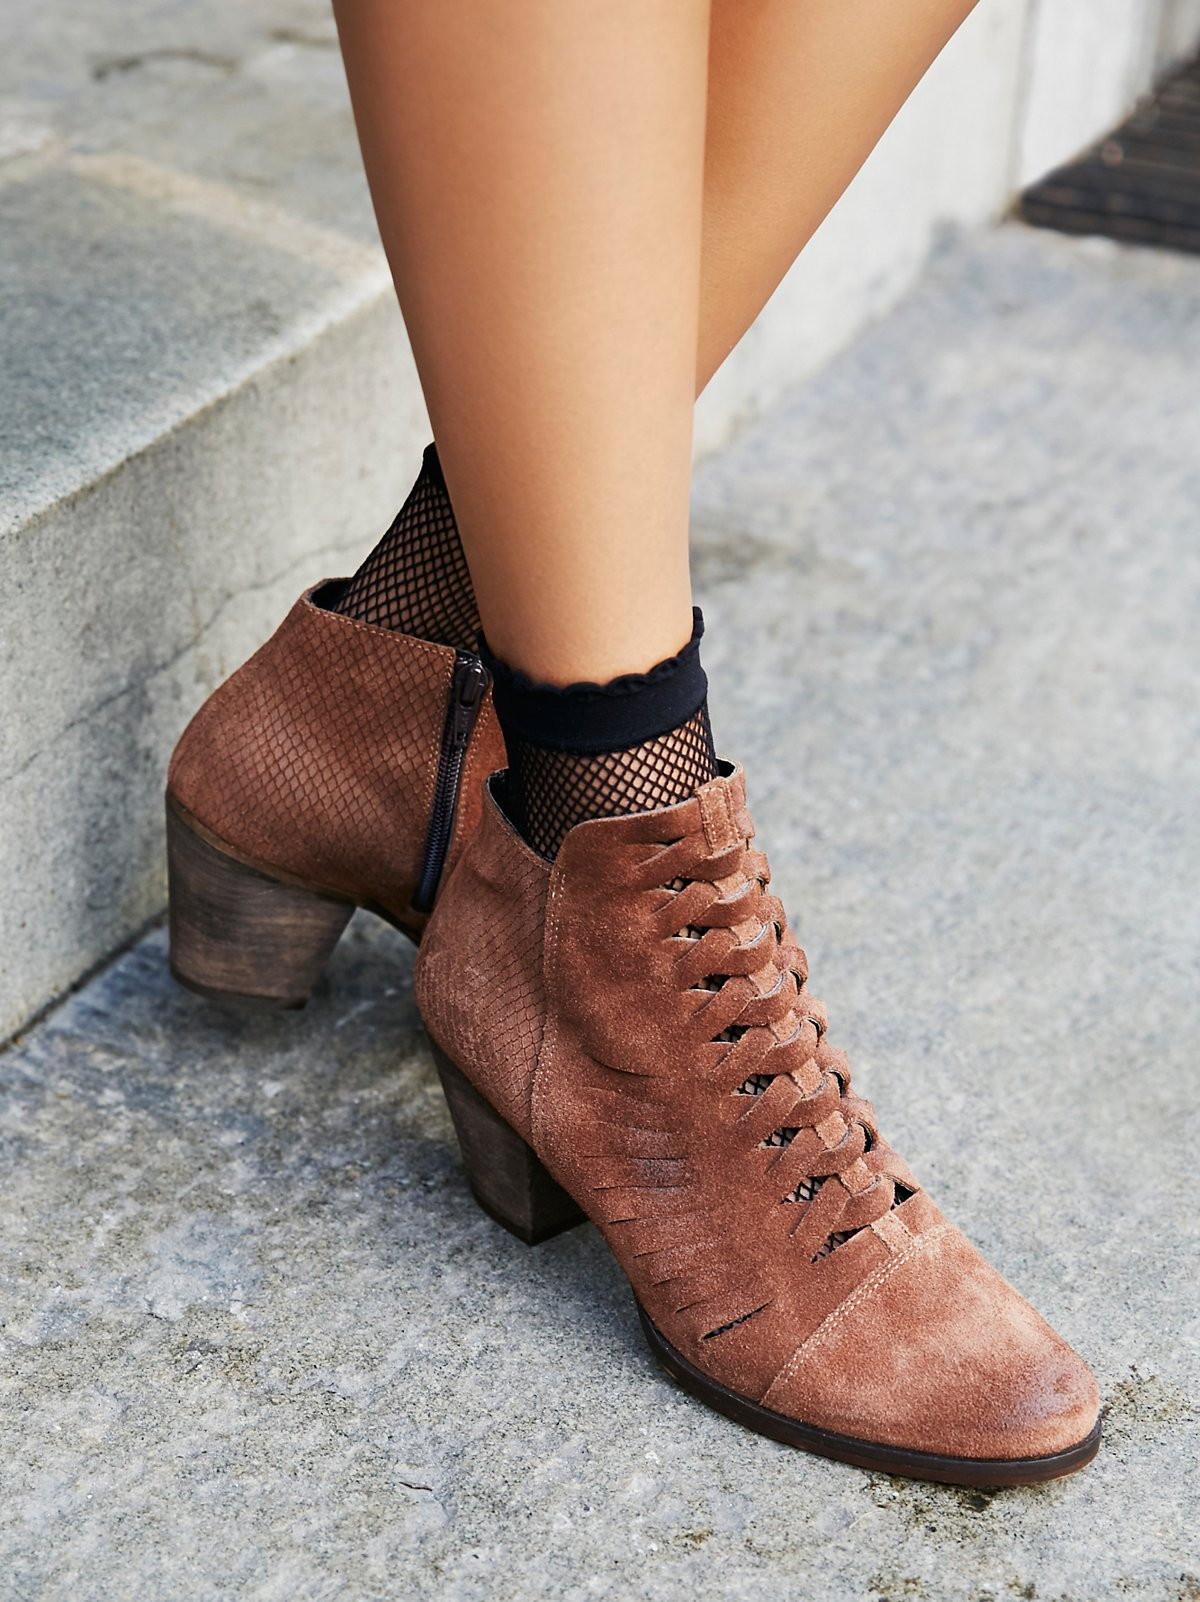 Loveland踝靴